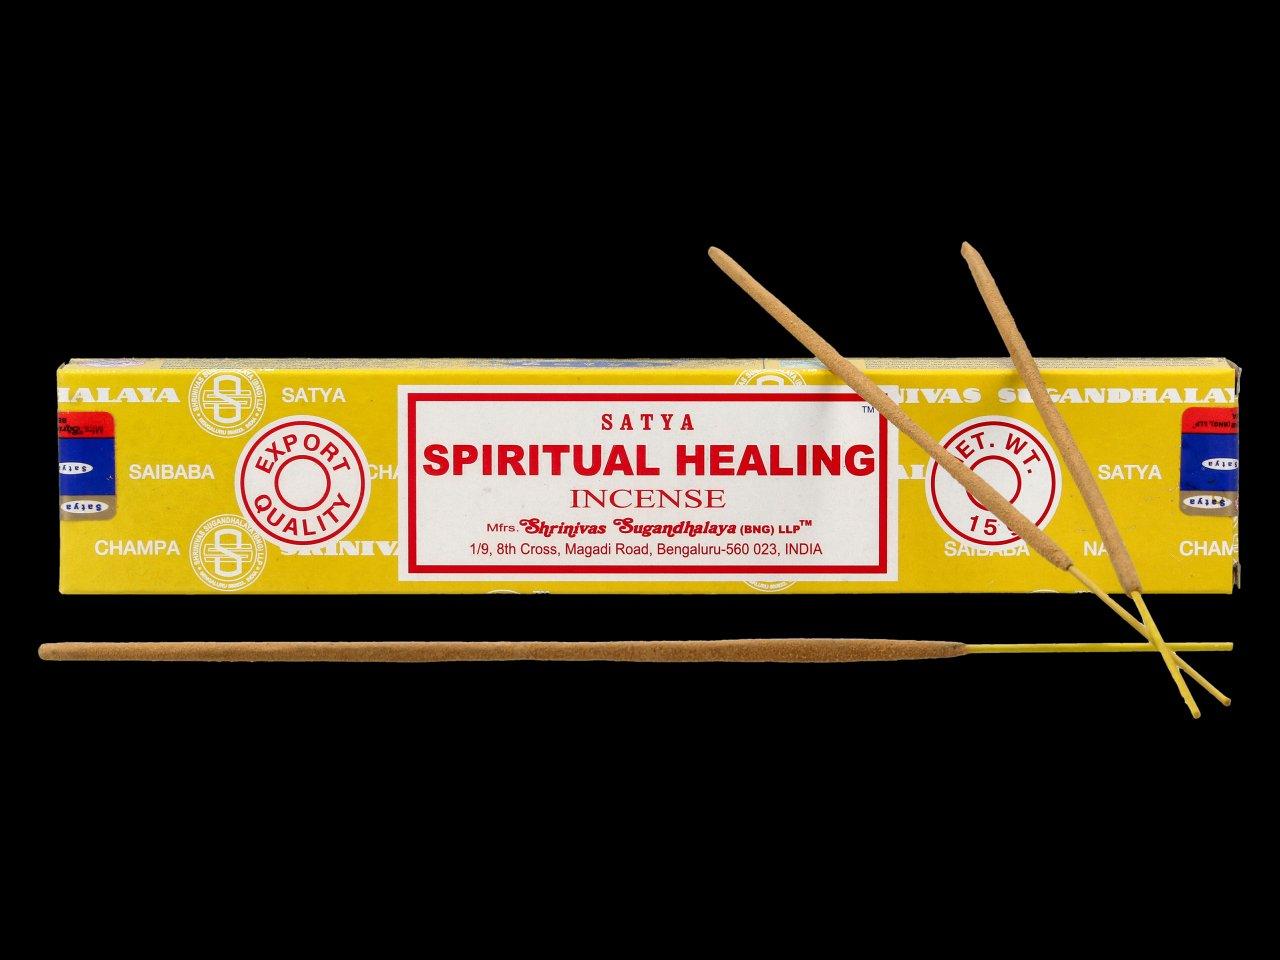 Incense Sticks - Spiritual Healing by Satya